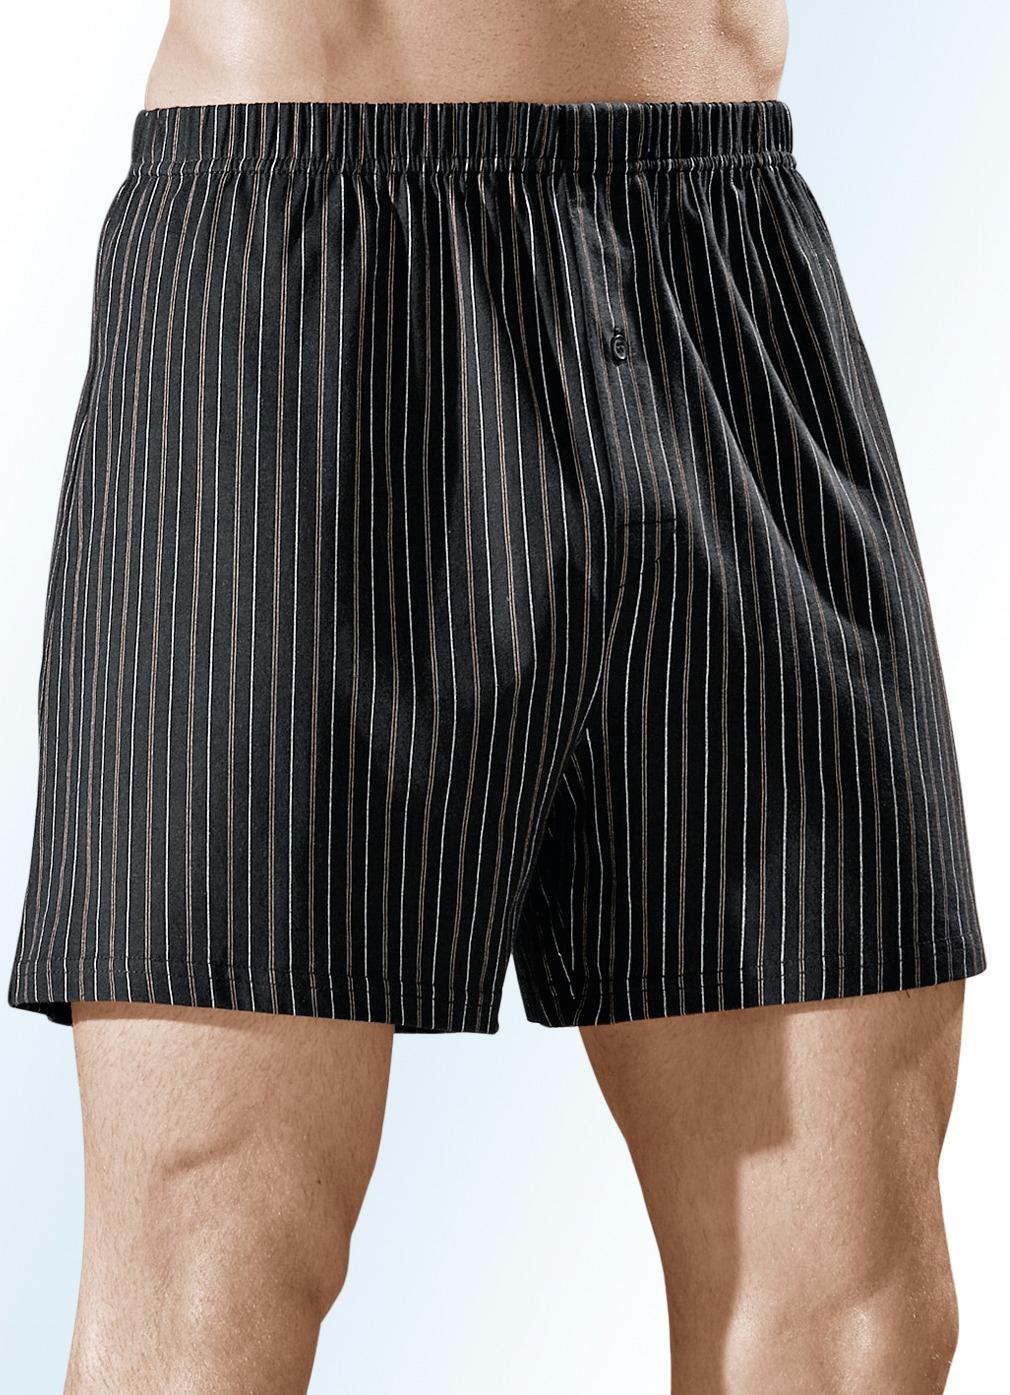 viererpack boxershorts bunt gestreift w sche bader. Black Bedroom Furniture Sets. Home Design Ideas